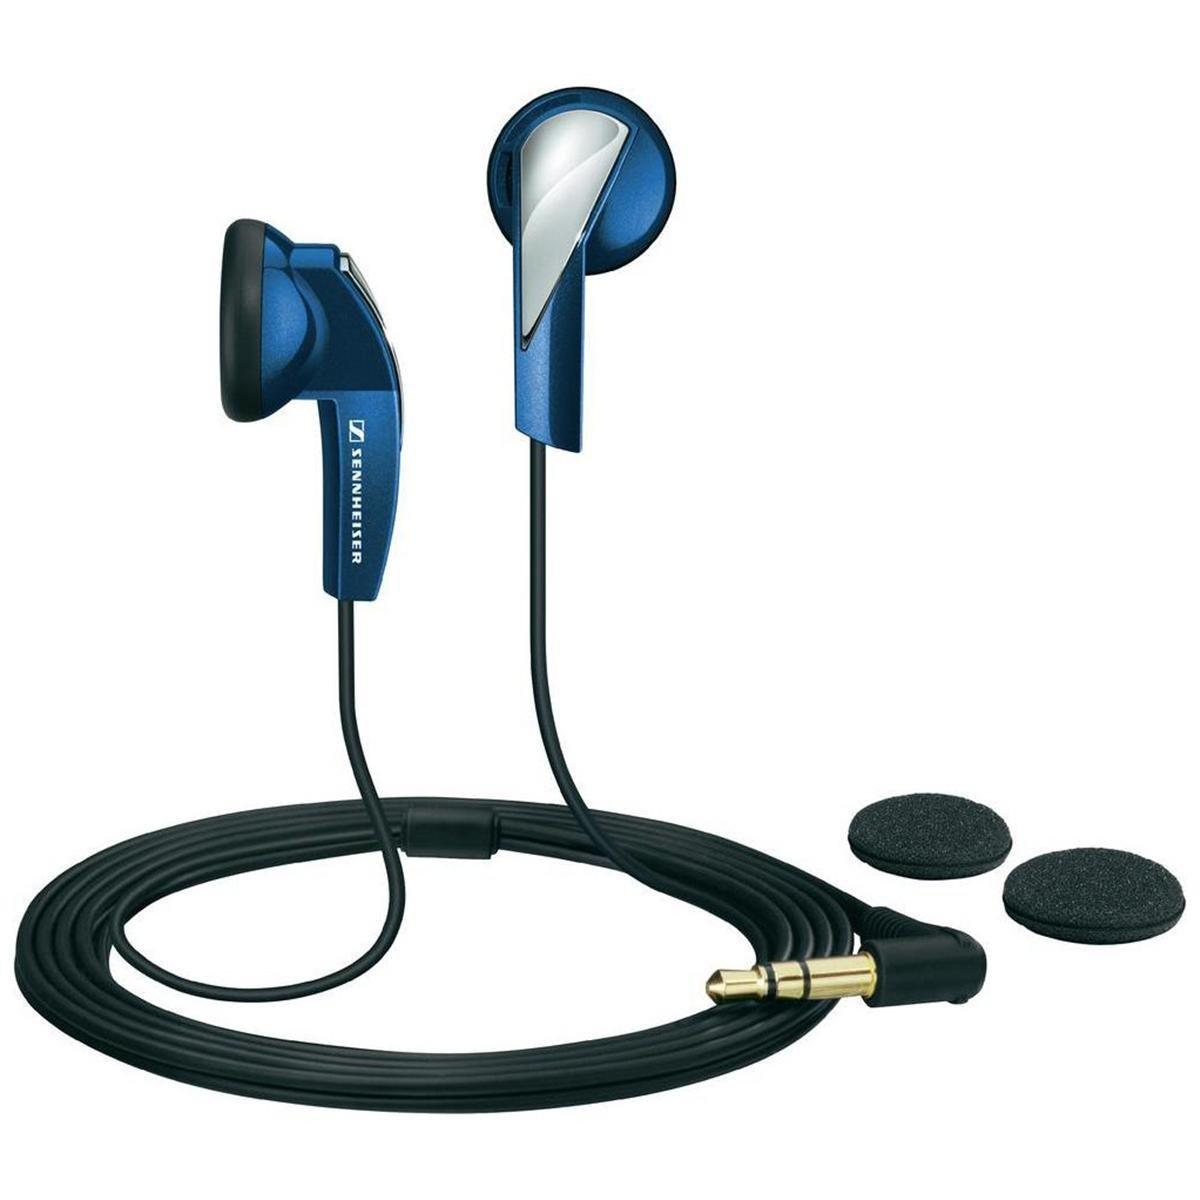 Sennheiser MX 365 In-Ear Portable Media Players: Amazon co uk